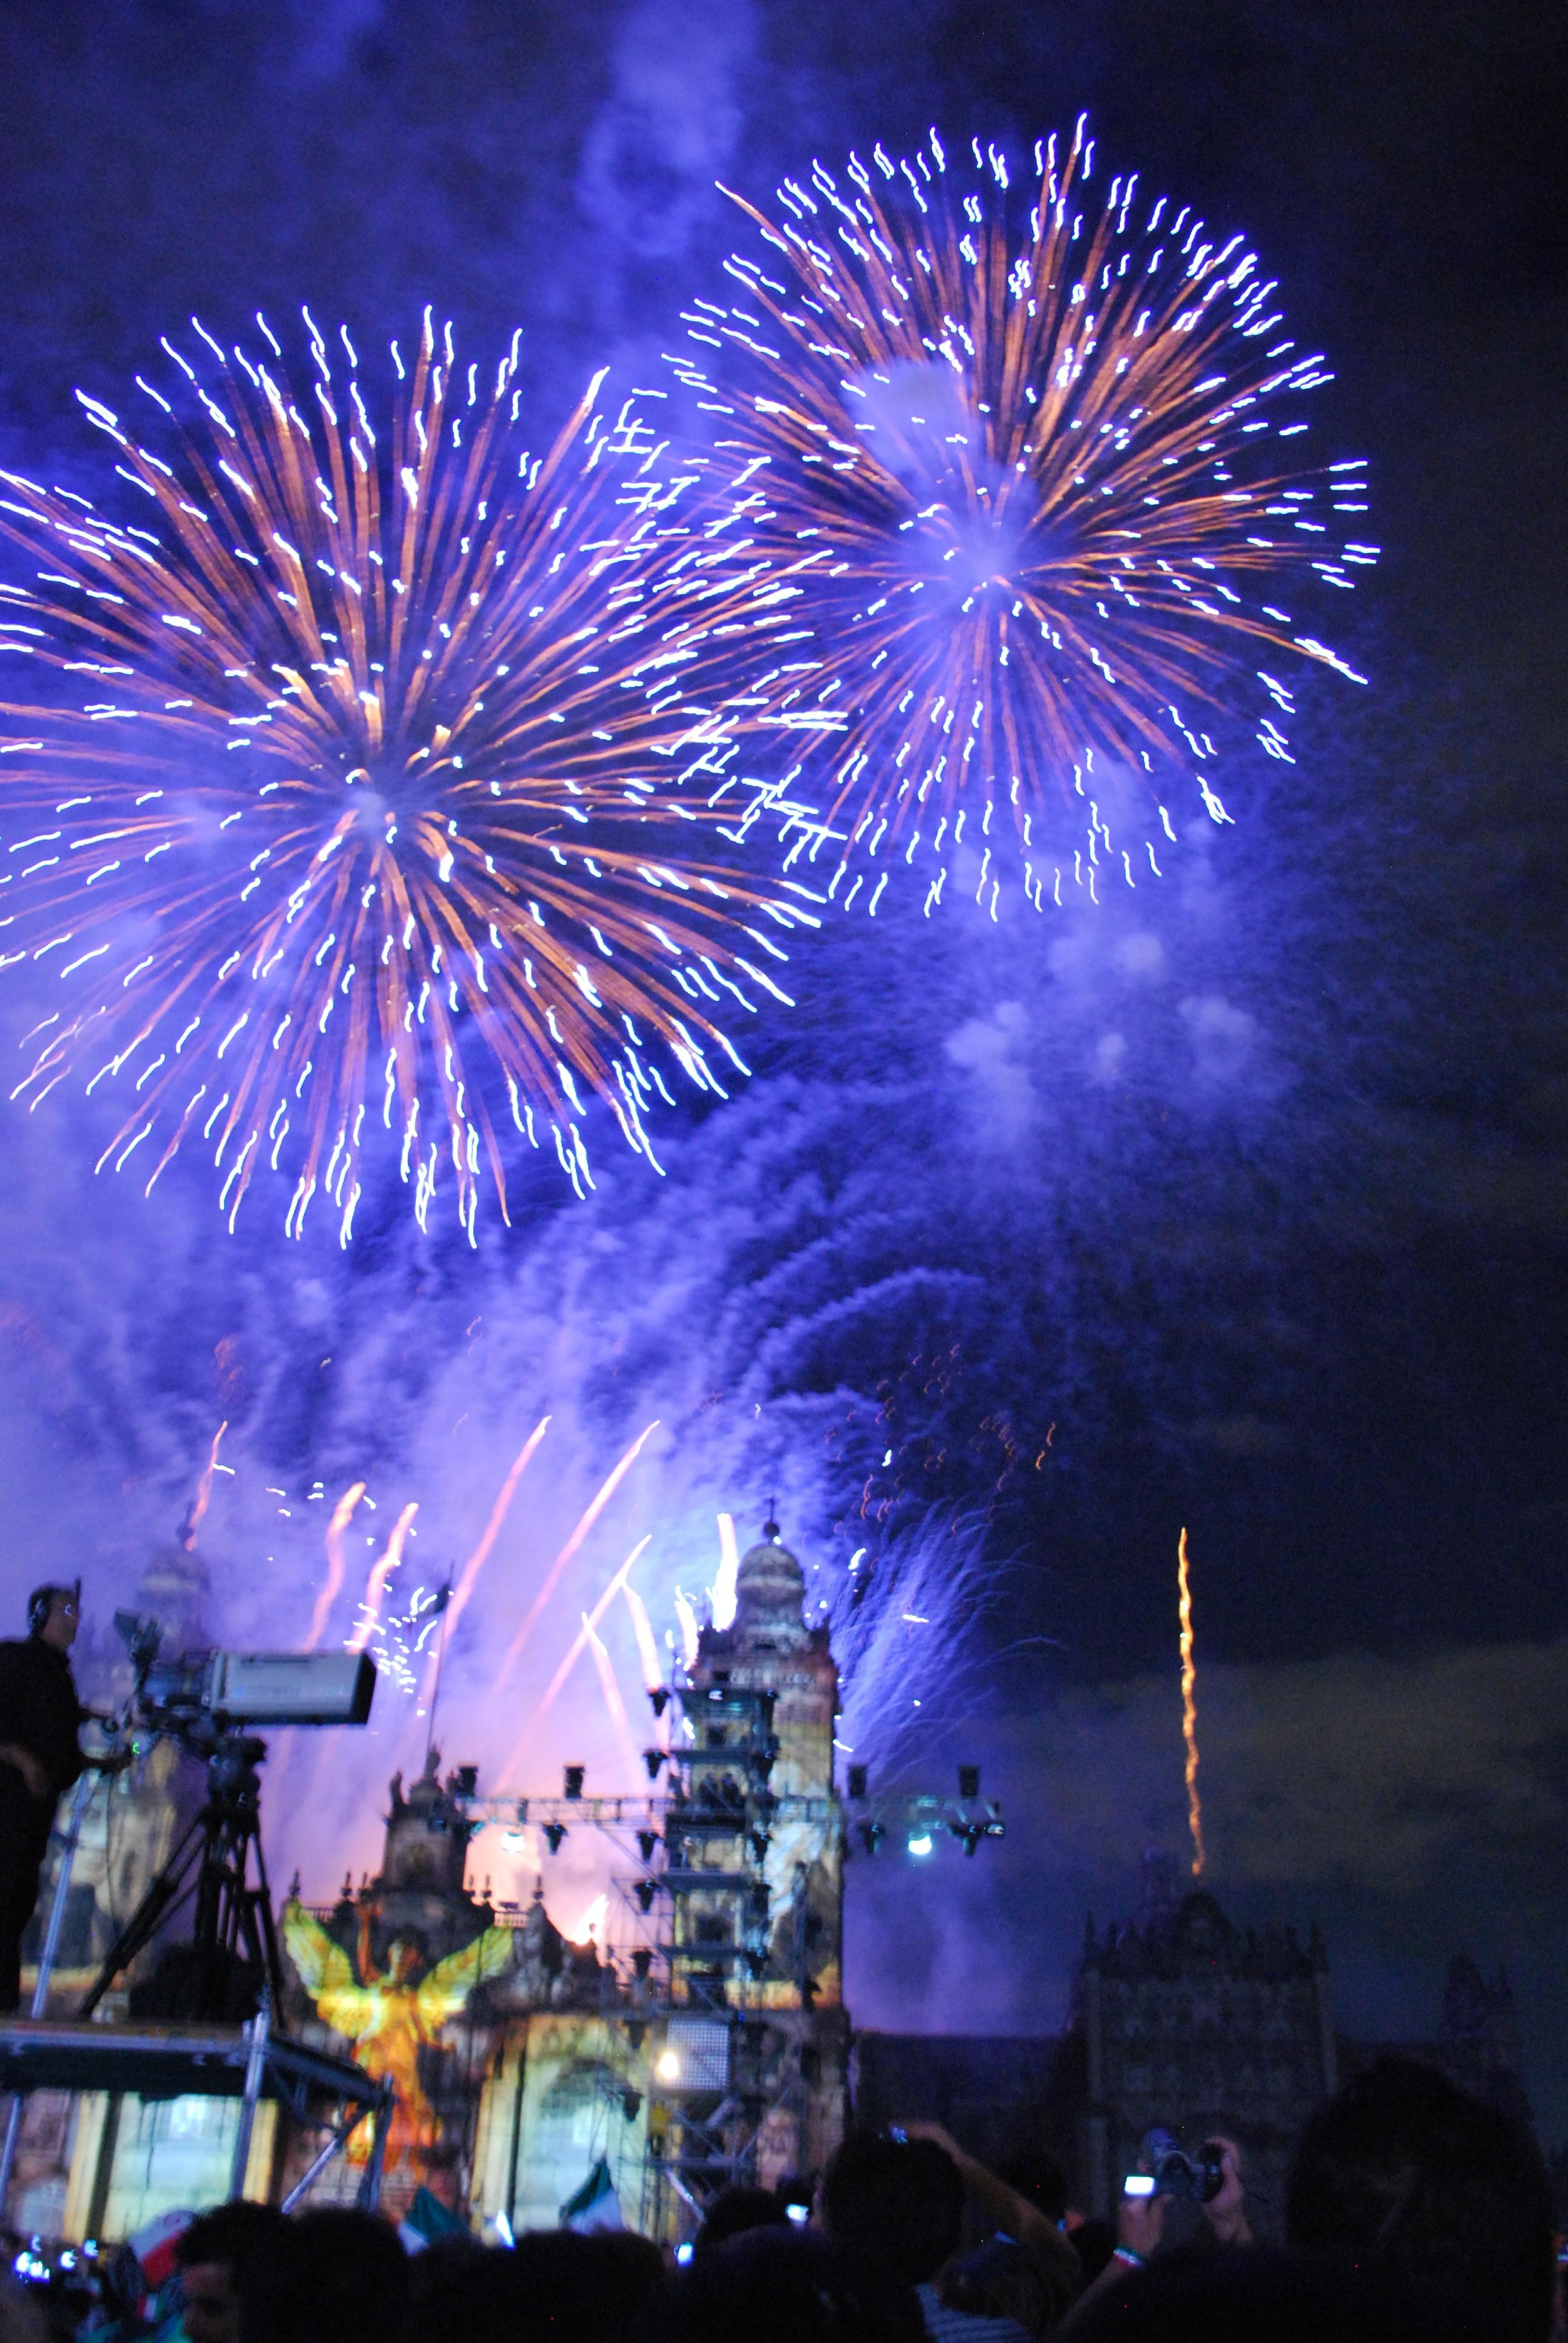 FireworksGrito2010Zocalo02 JPG